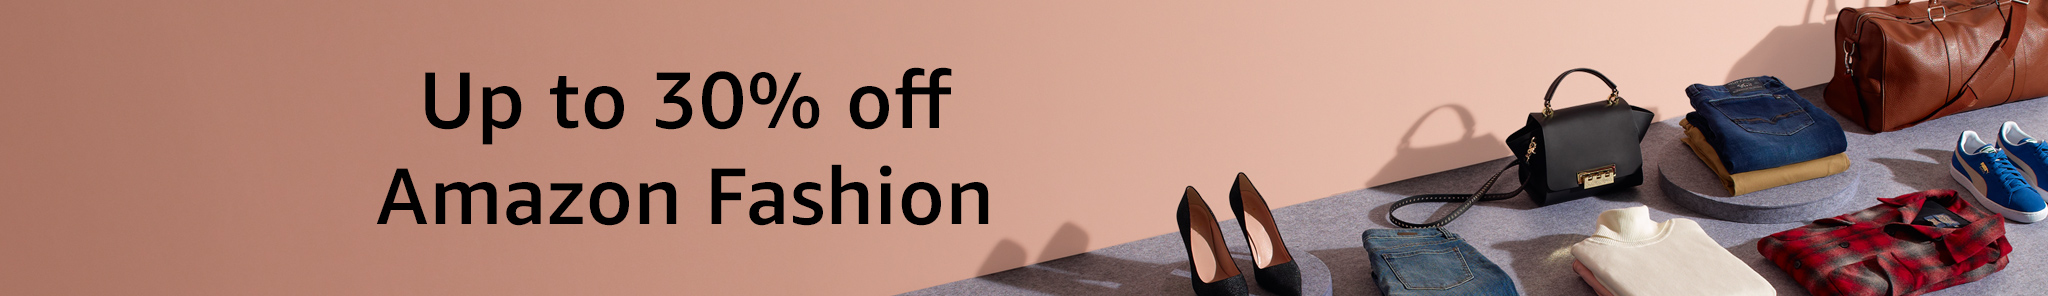 Up to 30% Off Amazon Fashion